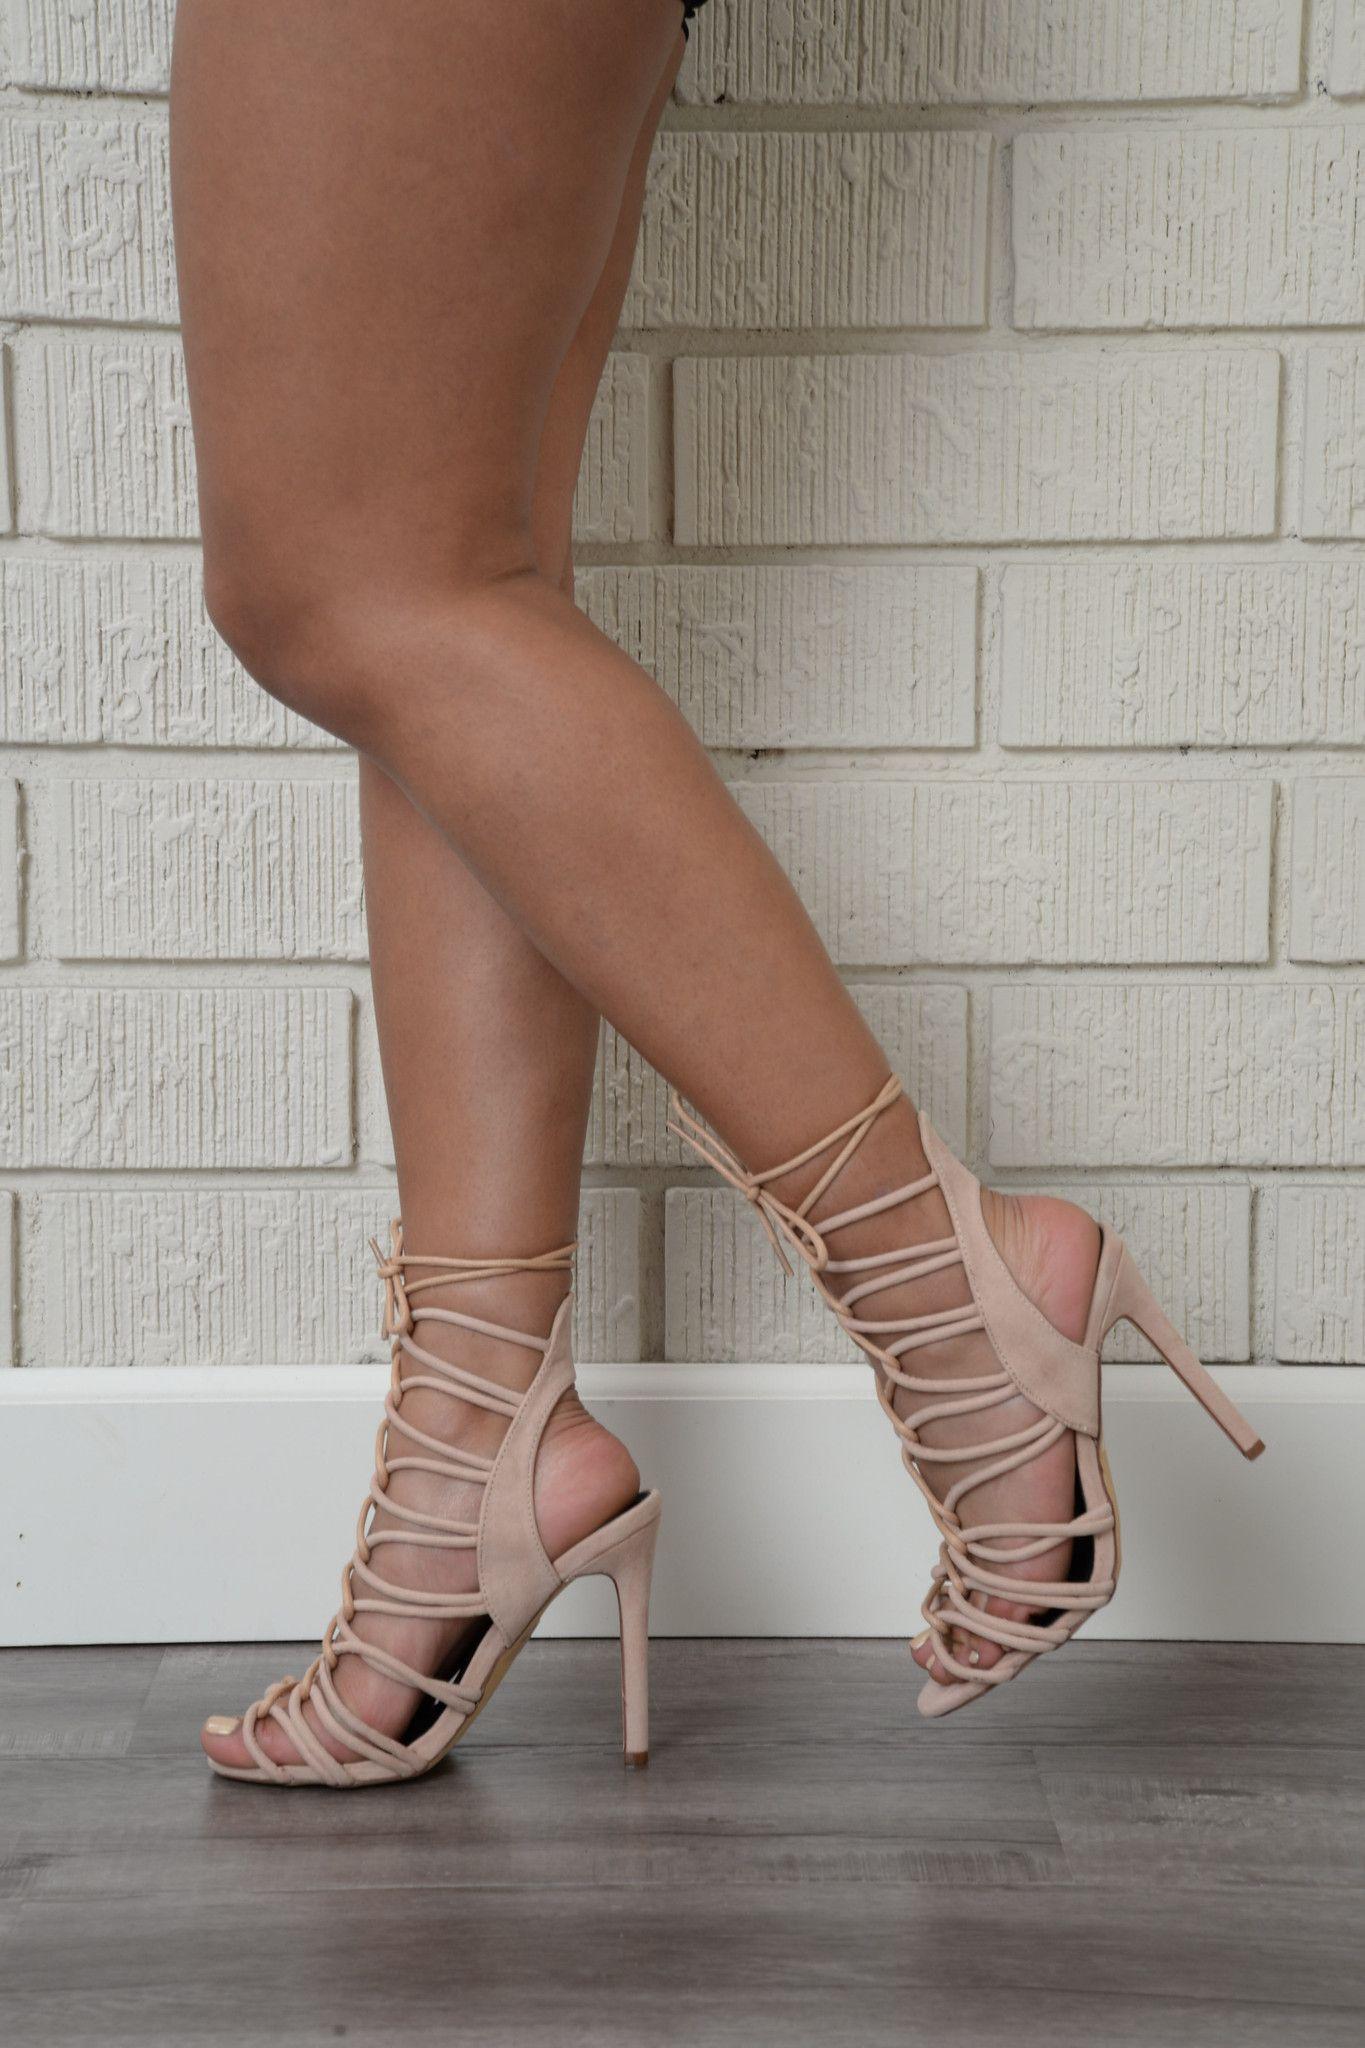 990403ad640 Dirty Dancing - Nude Nude Heels